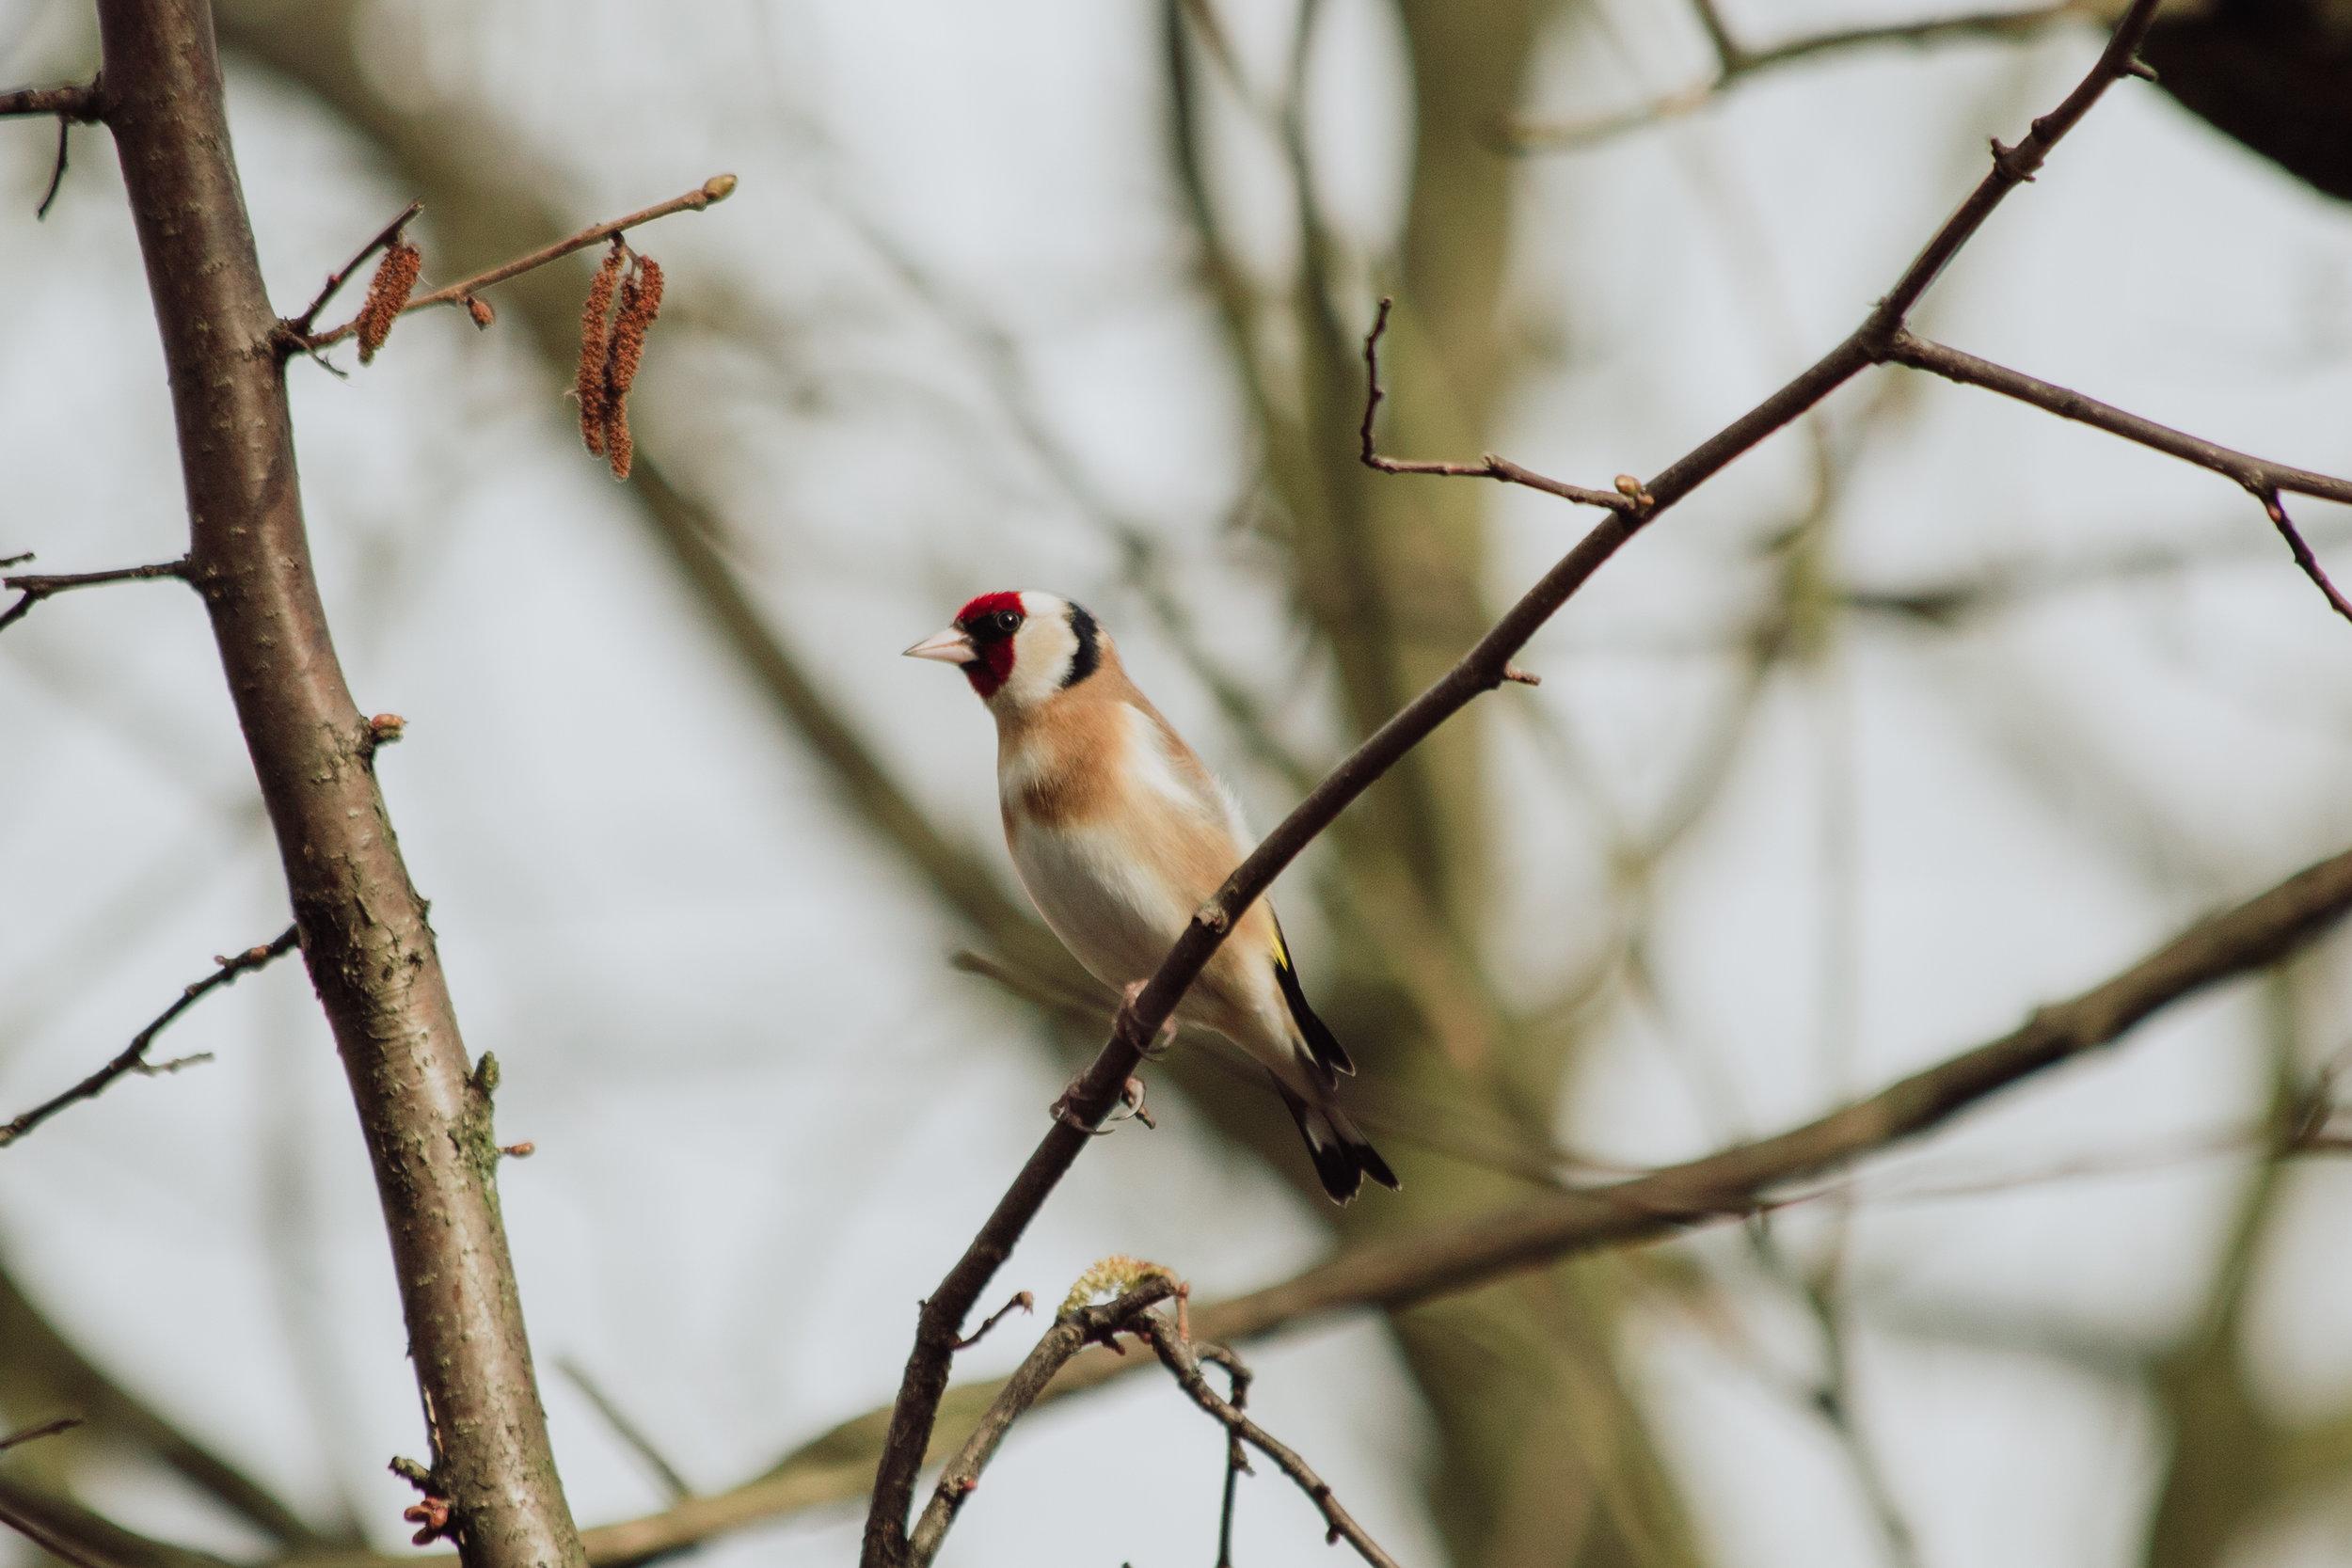 Feeding-the-birds-in-your-garden